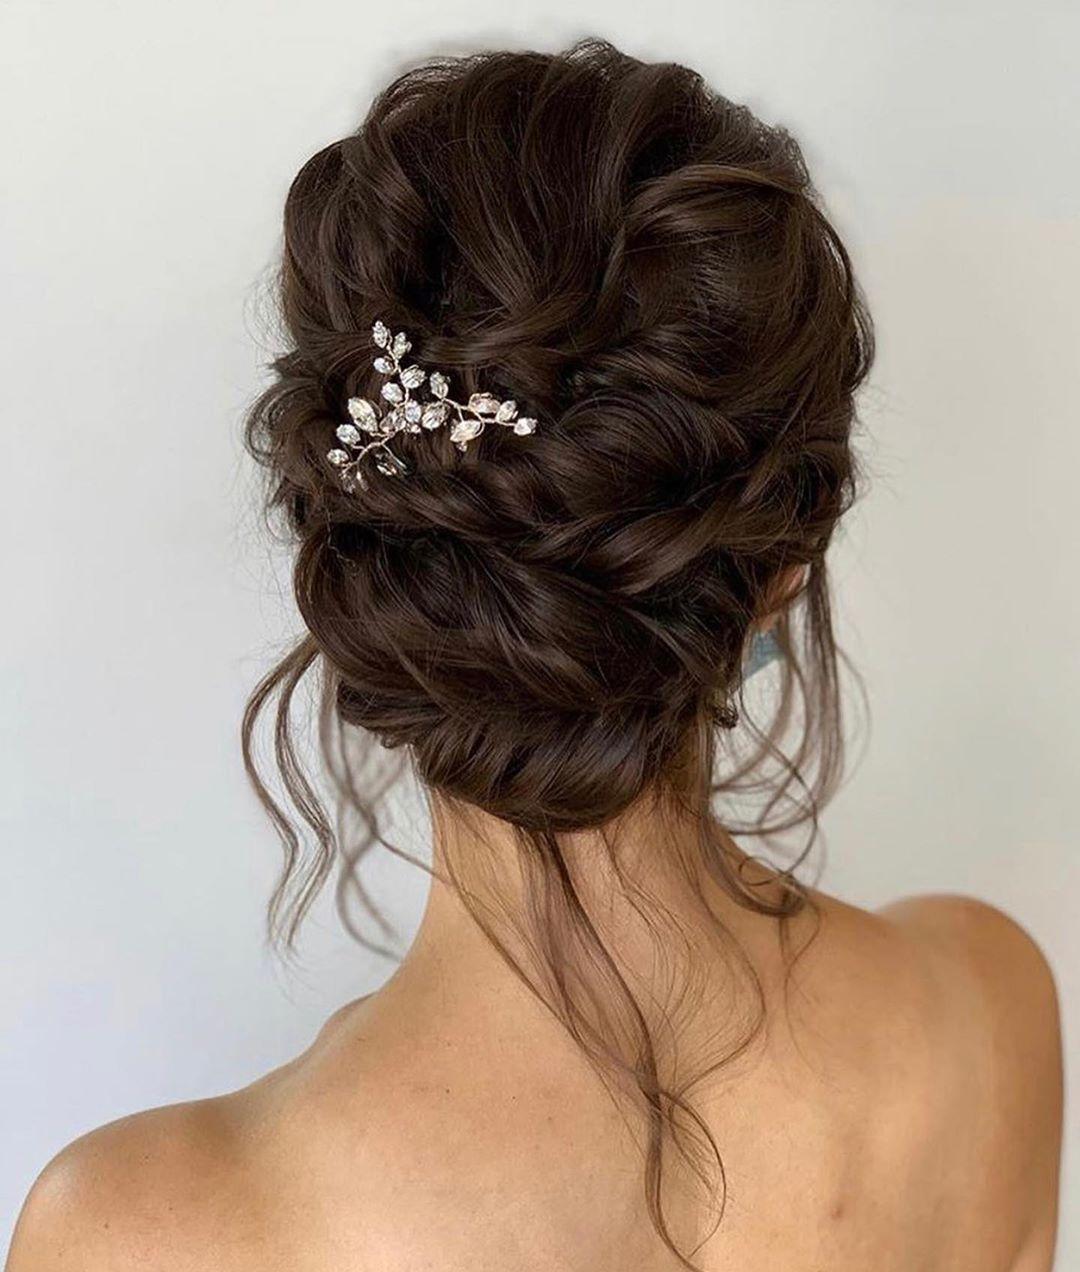 50x Prachtige Bruidskapsels En Trouwkapsels Voor 2020 2021 Kapselinspiratie Ontdek Welke In 2020 Cool Braid Hairstyles Dance Hairstyles Matric Dance Hairstyles